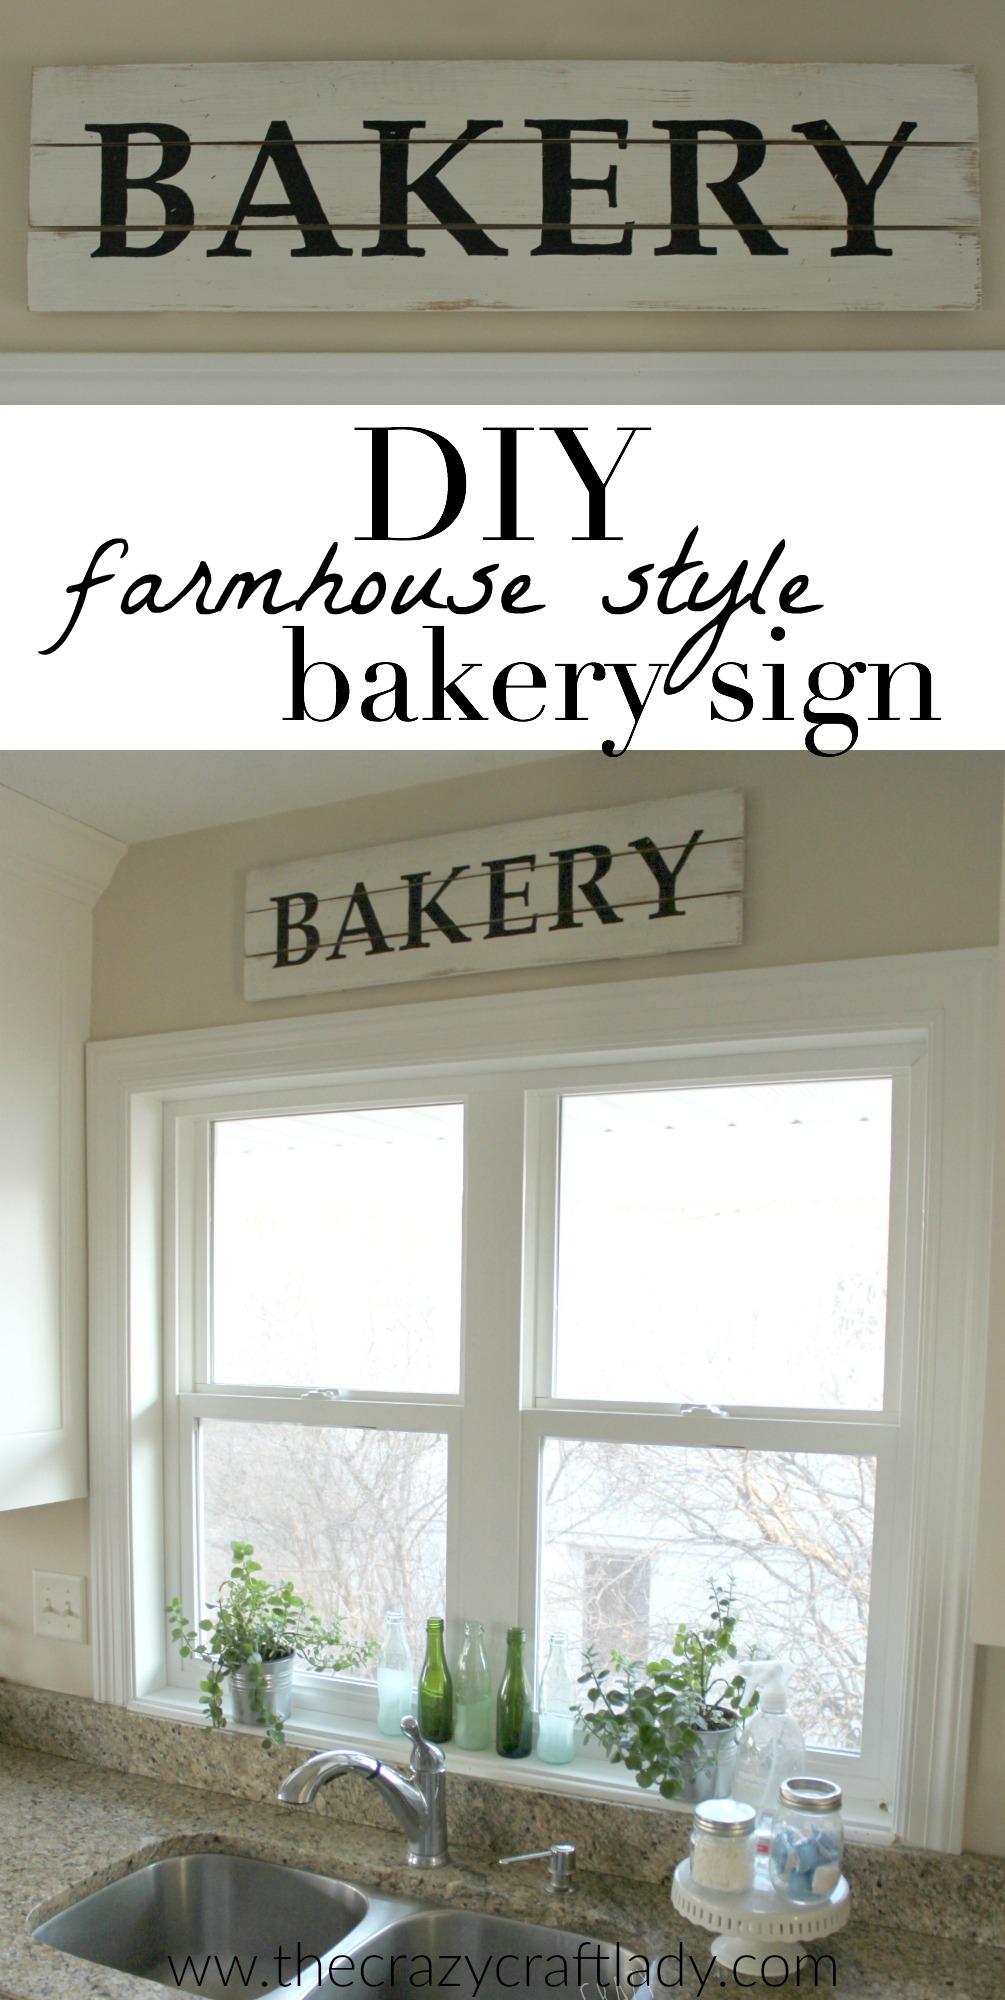 Diy Farmhouse Style Bakery Kitchen Sign The Crazy Craft Lady